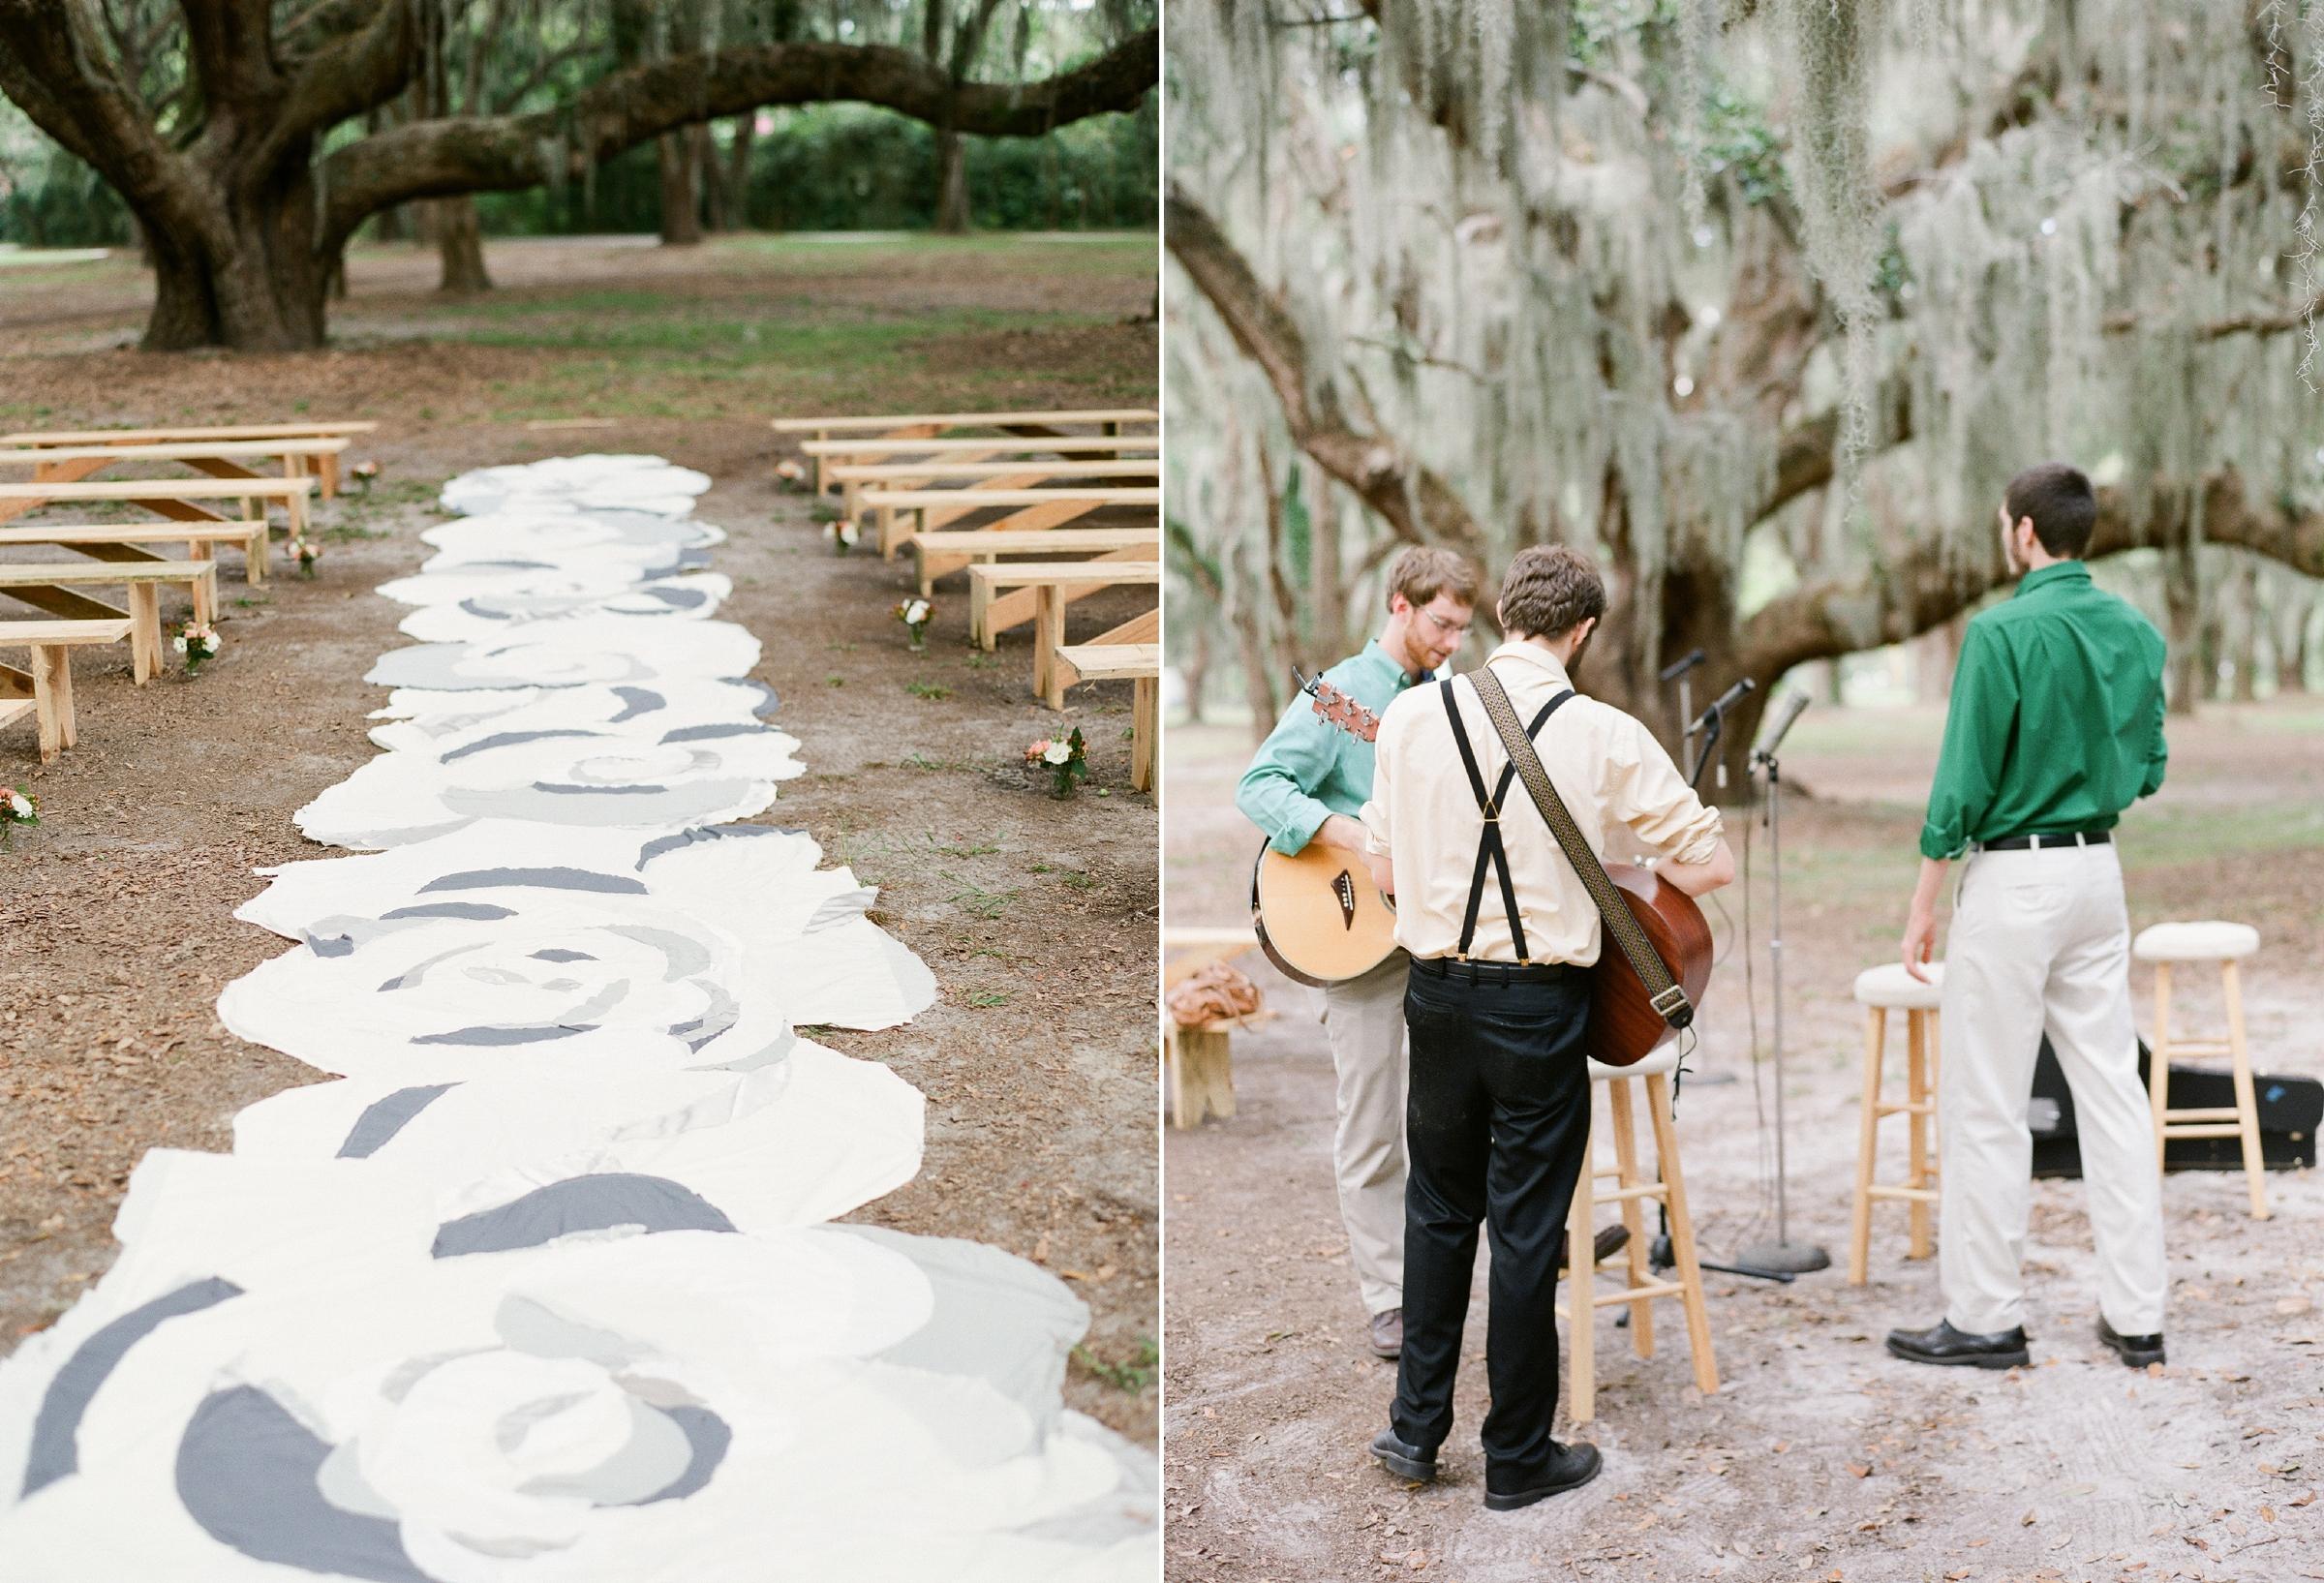 st_simons_island_wedding_photographer_shannon_griffin_0015.jpg